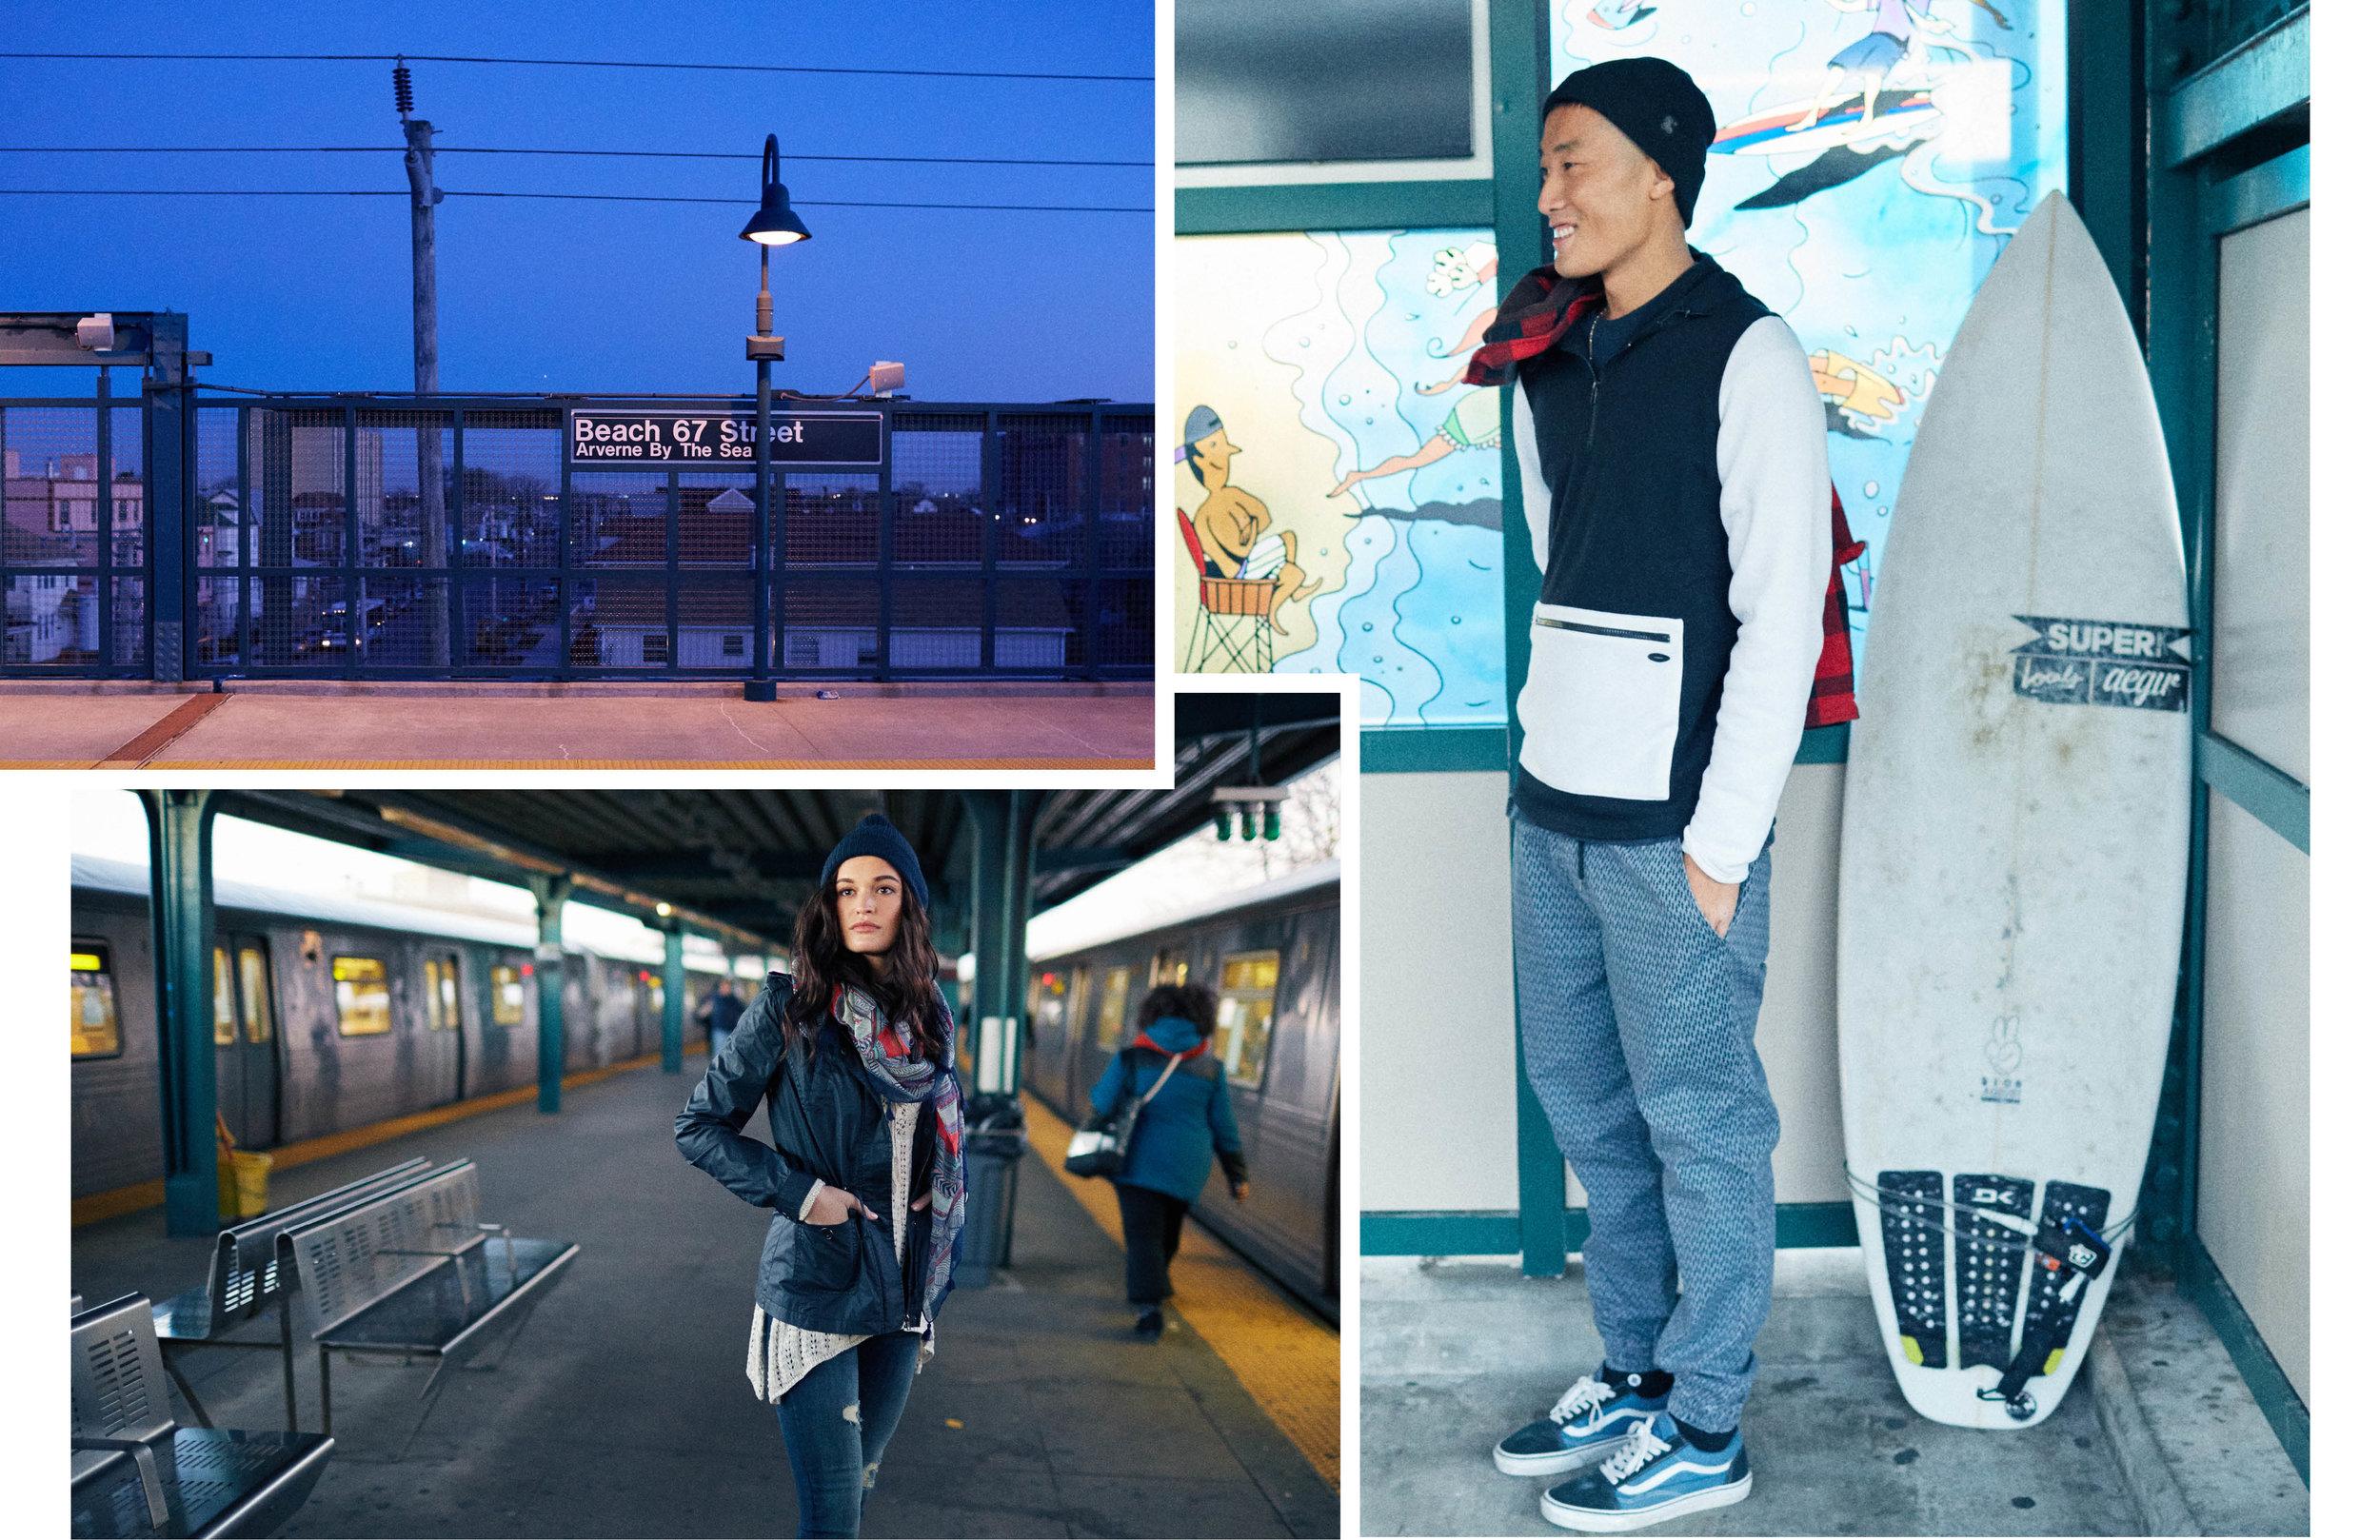 JourneyTumblr4.jpg